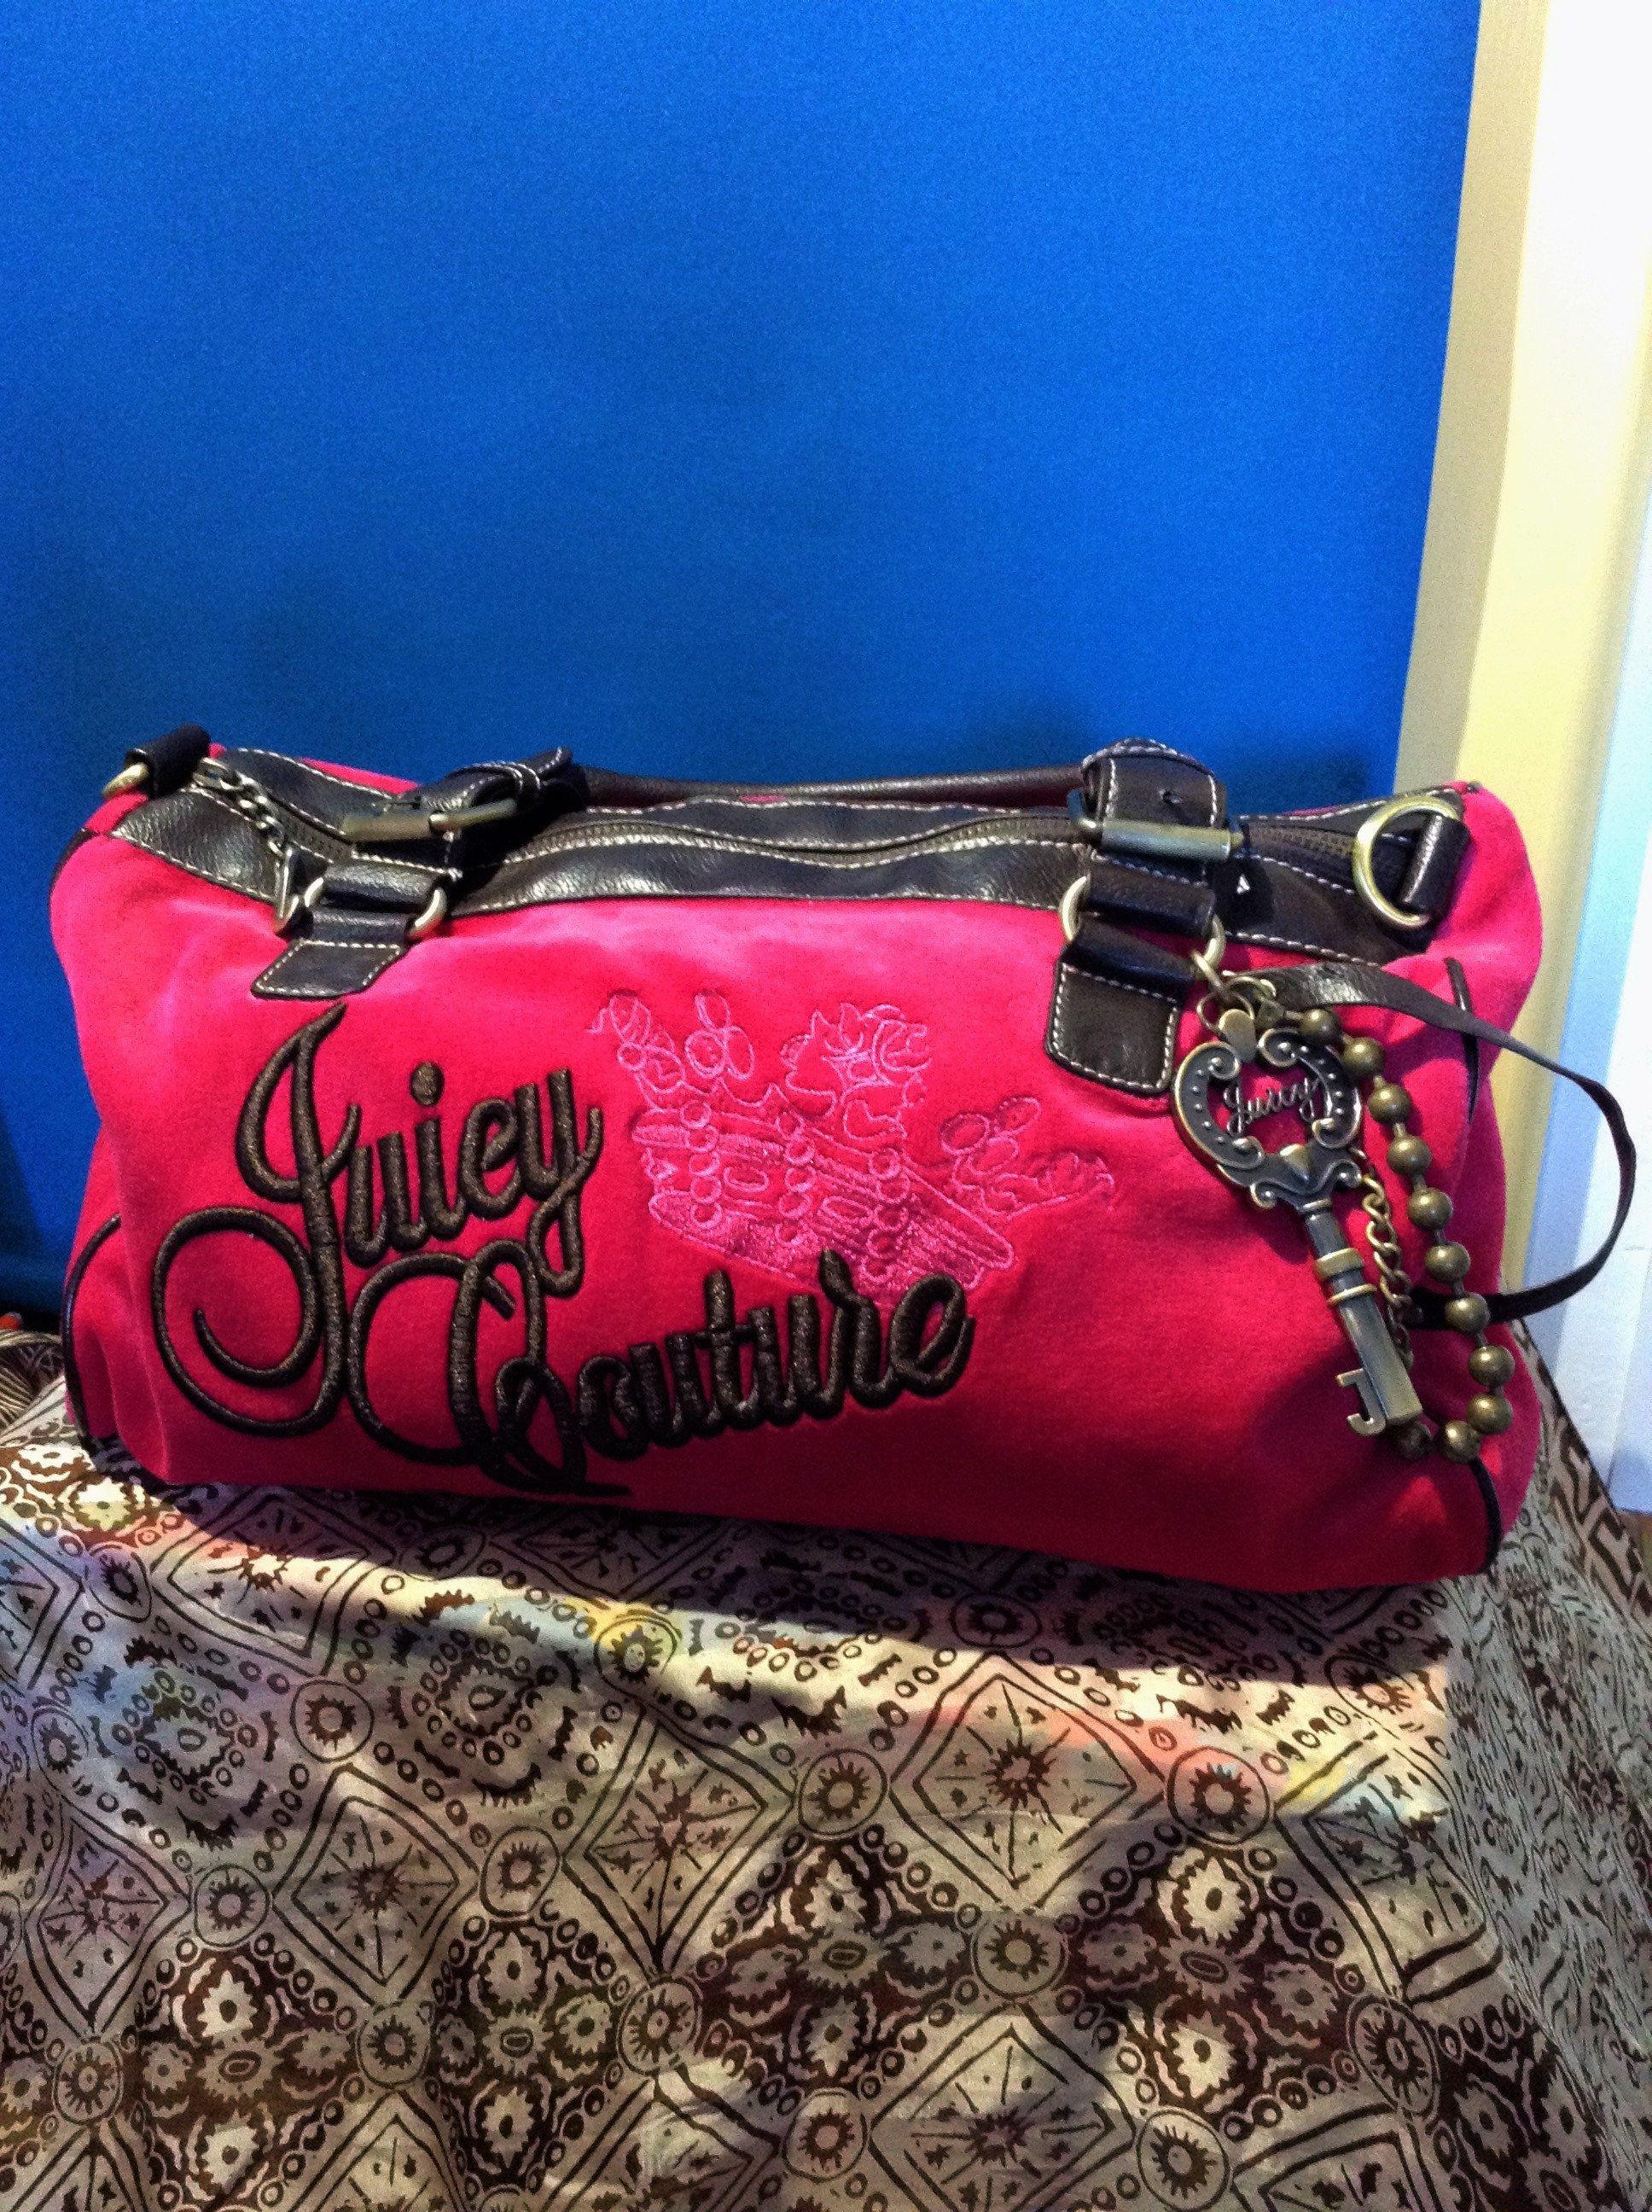 Juicy Couture Handbag Pink And Brown Vintage Leather Cloth Bag Charms Tote Bag Shoulder Bag Gift With Images Juicy Couture Handbags Juicy Couture Bags Handbags Louis Vuitton Handbags